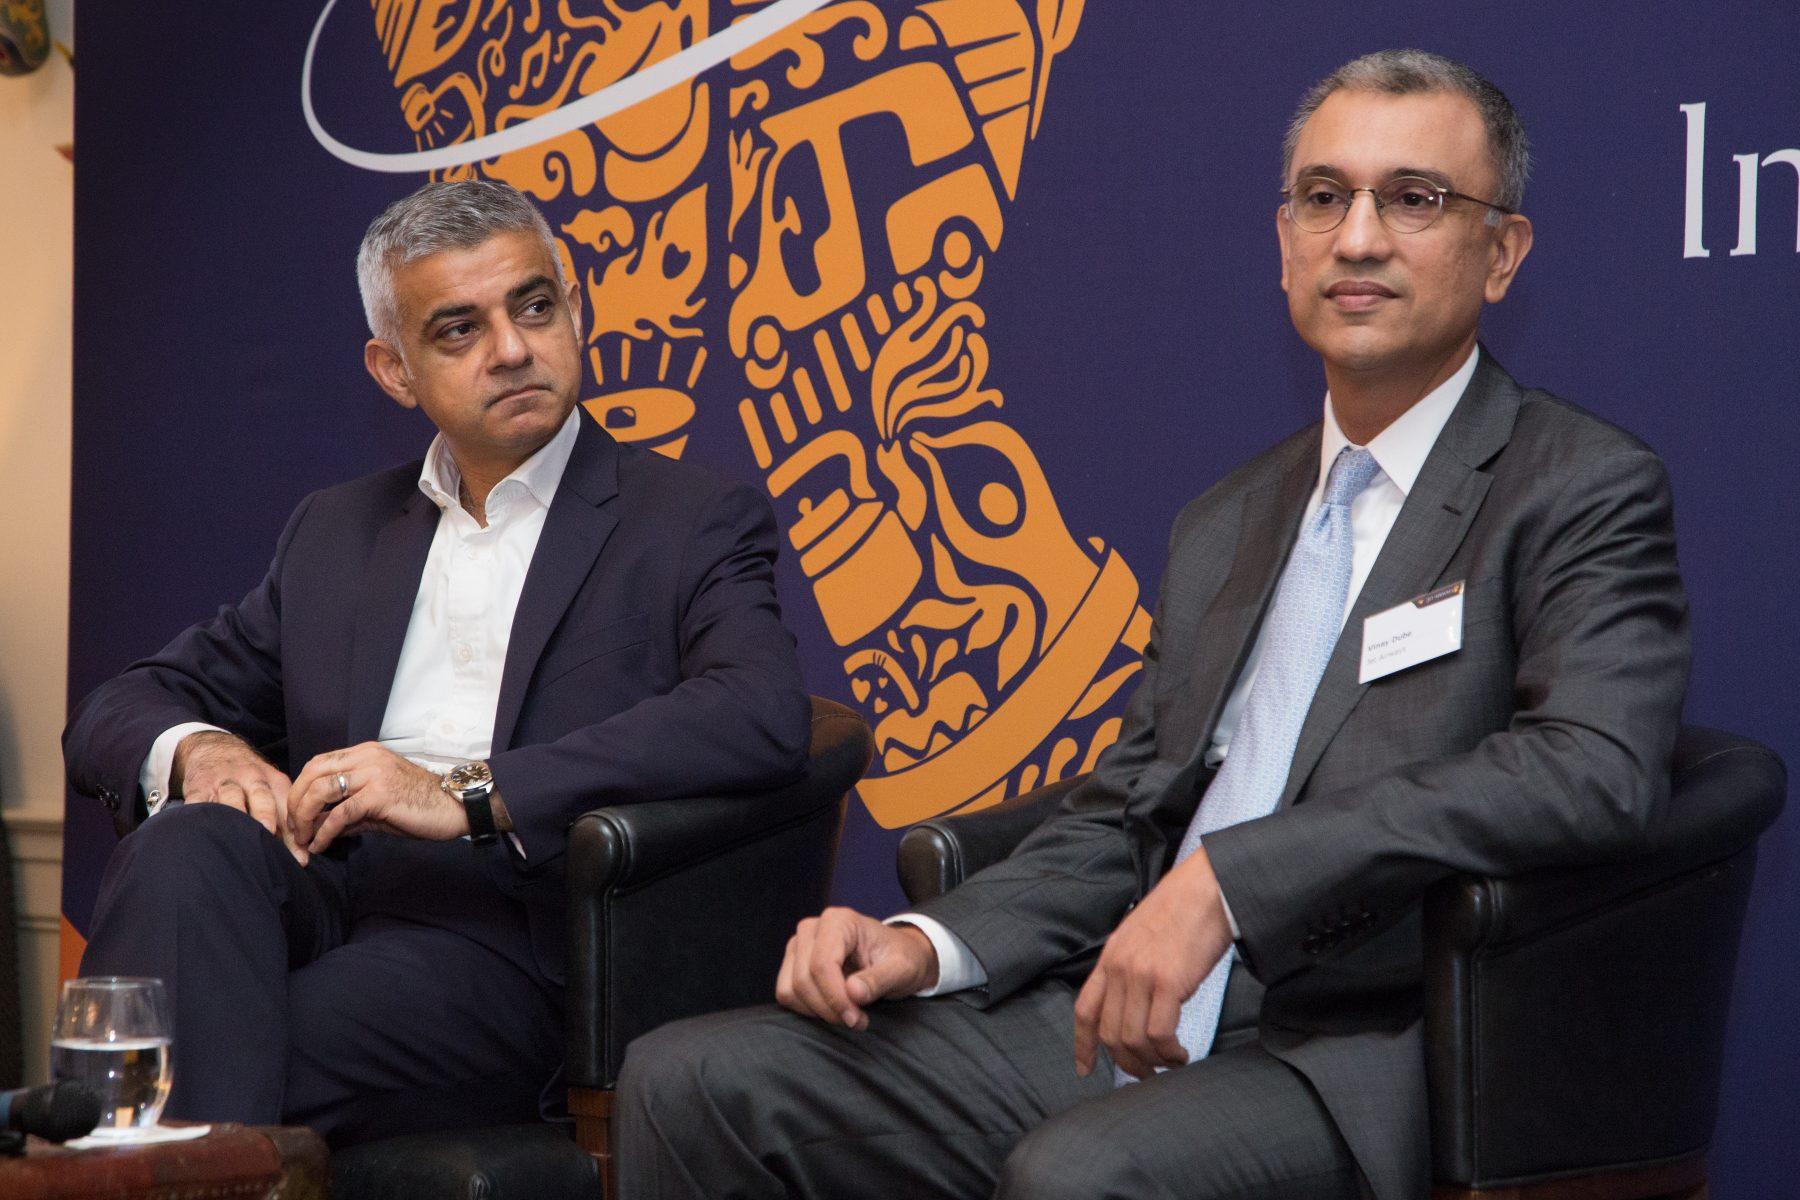 Dube with London Mayor Sadiq Khan